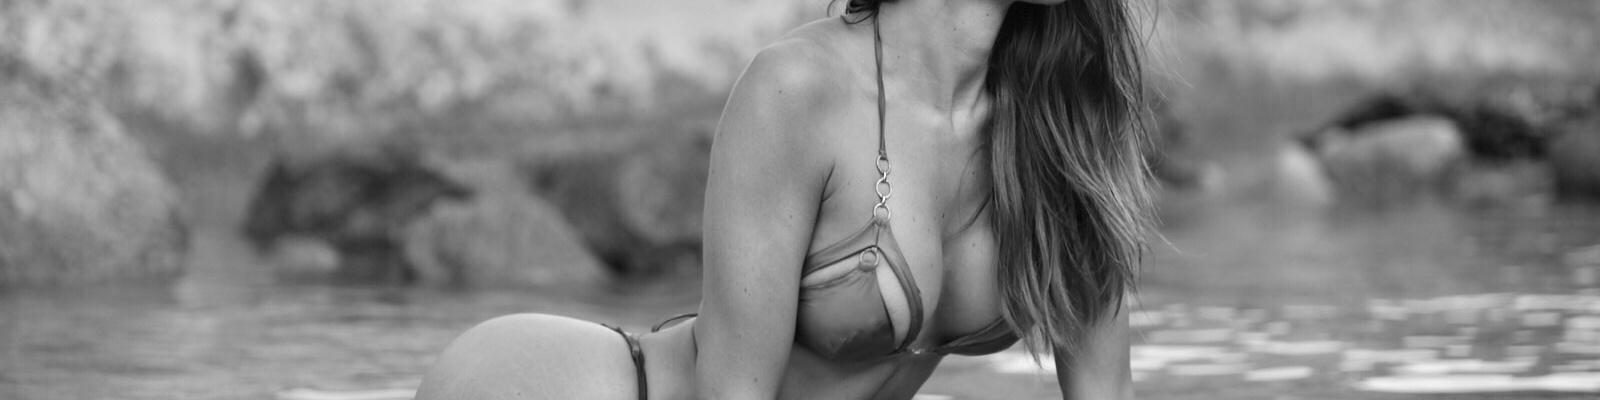 Giselle Escort